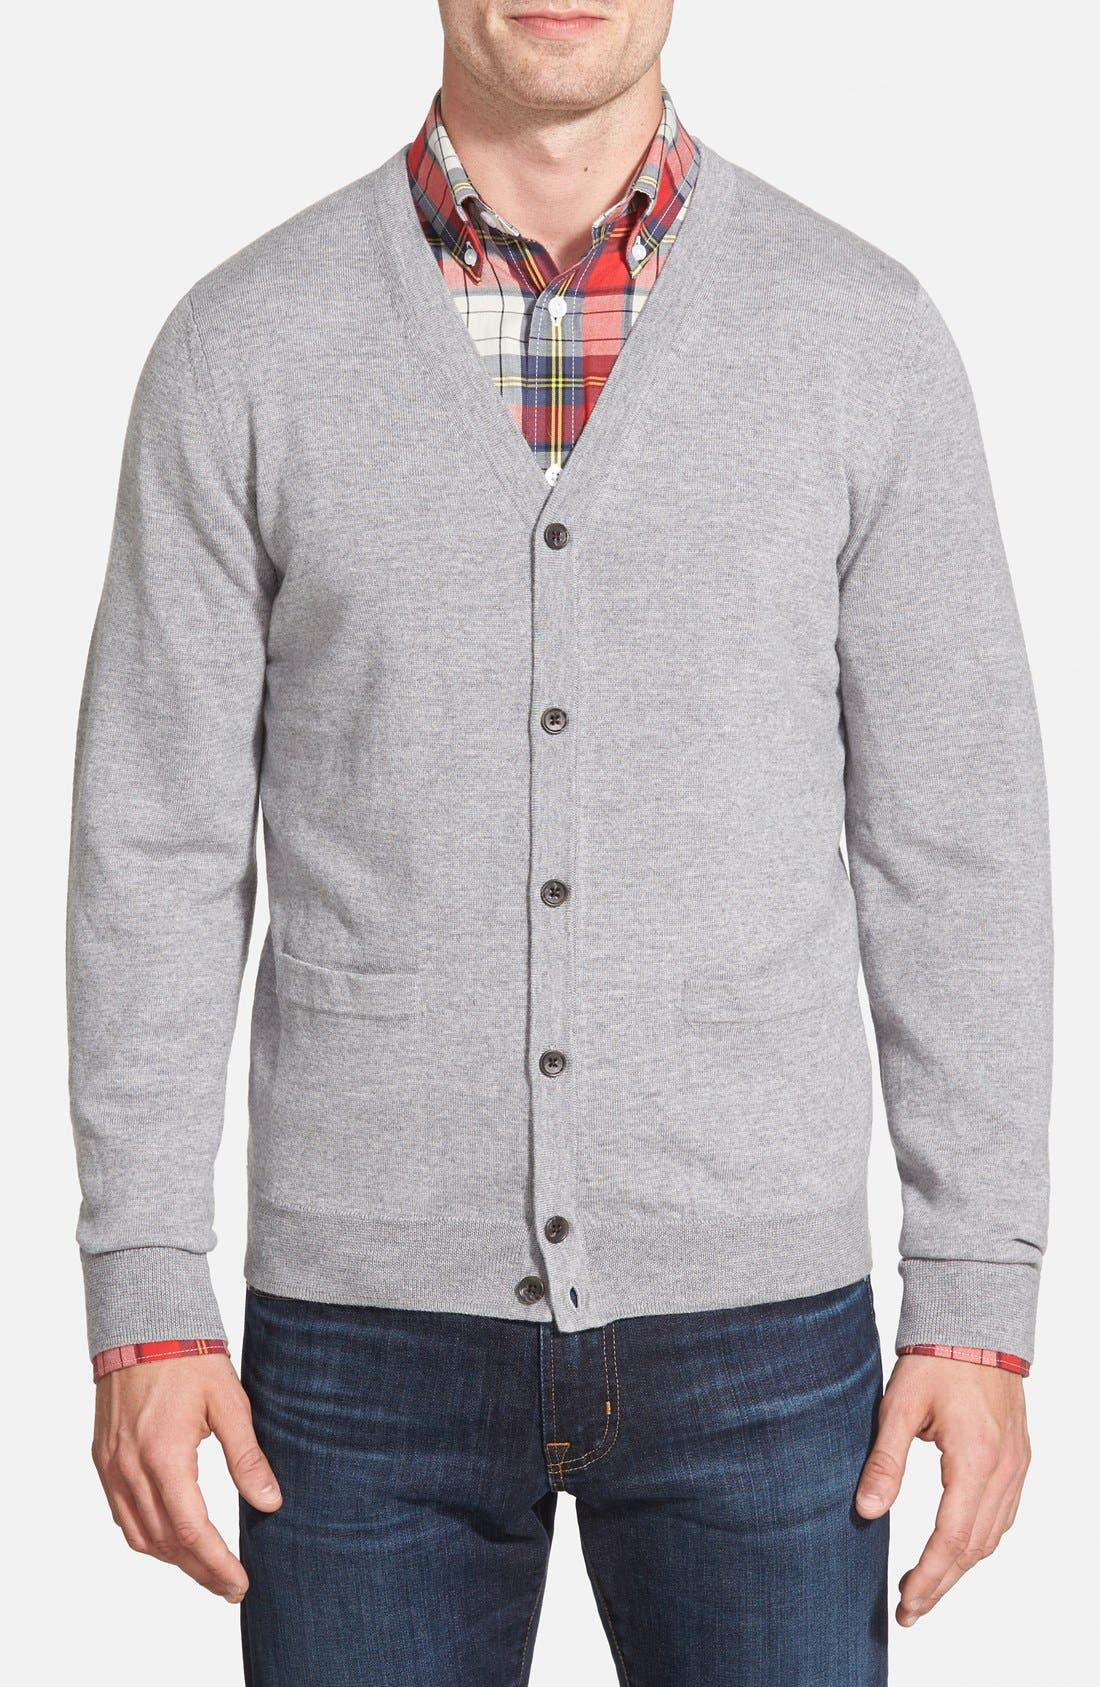 Alternate Image 1 Selected - Nordstrom Men's Shop Merino Wool Cardigan